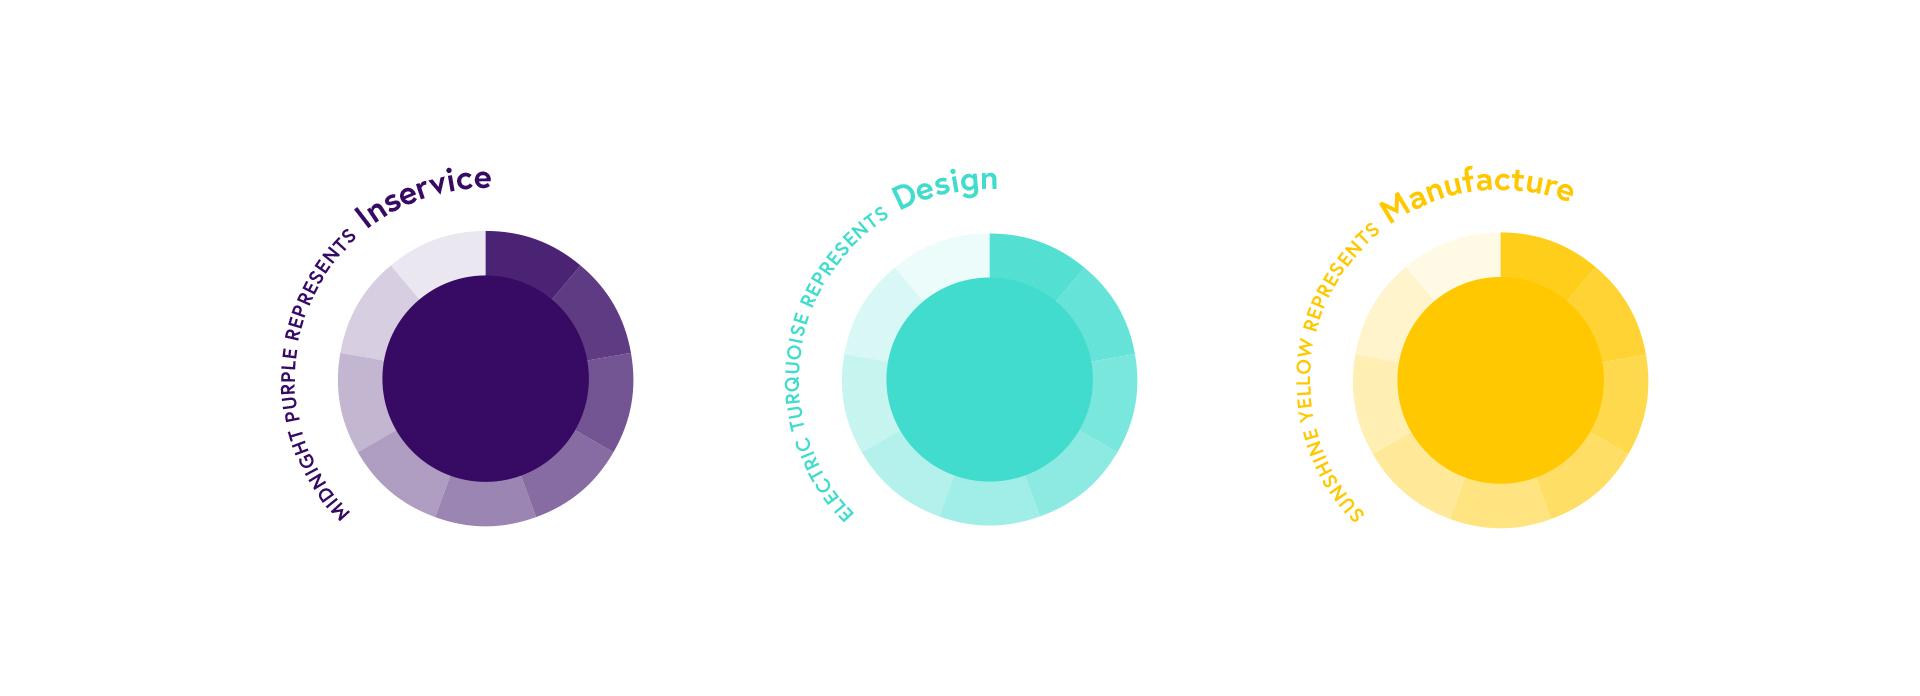 elsio logo colour breakdown